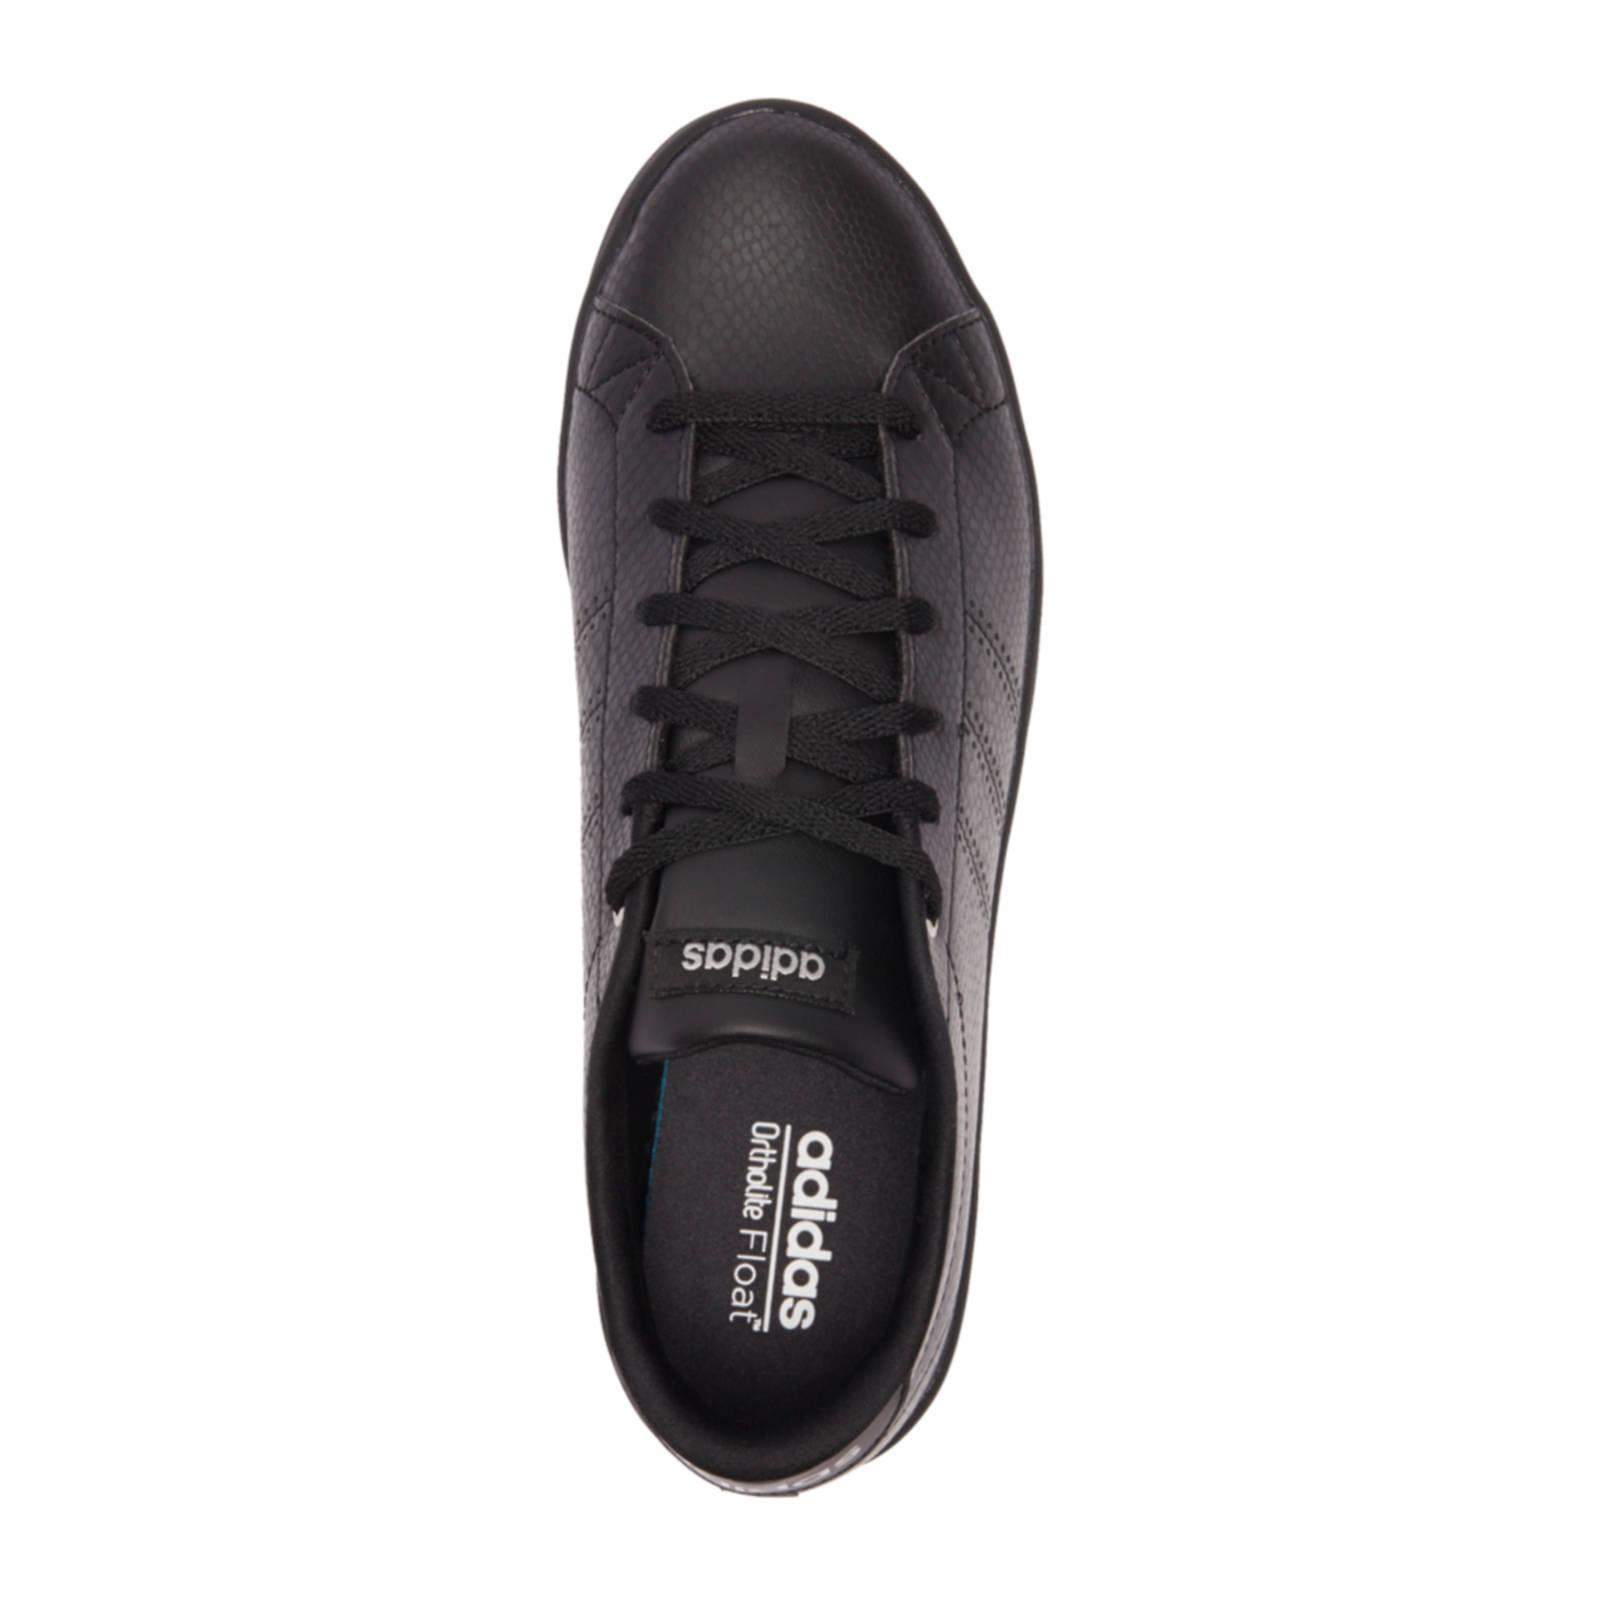 adidas Advantage Clean sneakers met reptielenprint | wehkamp